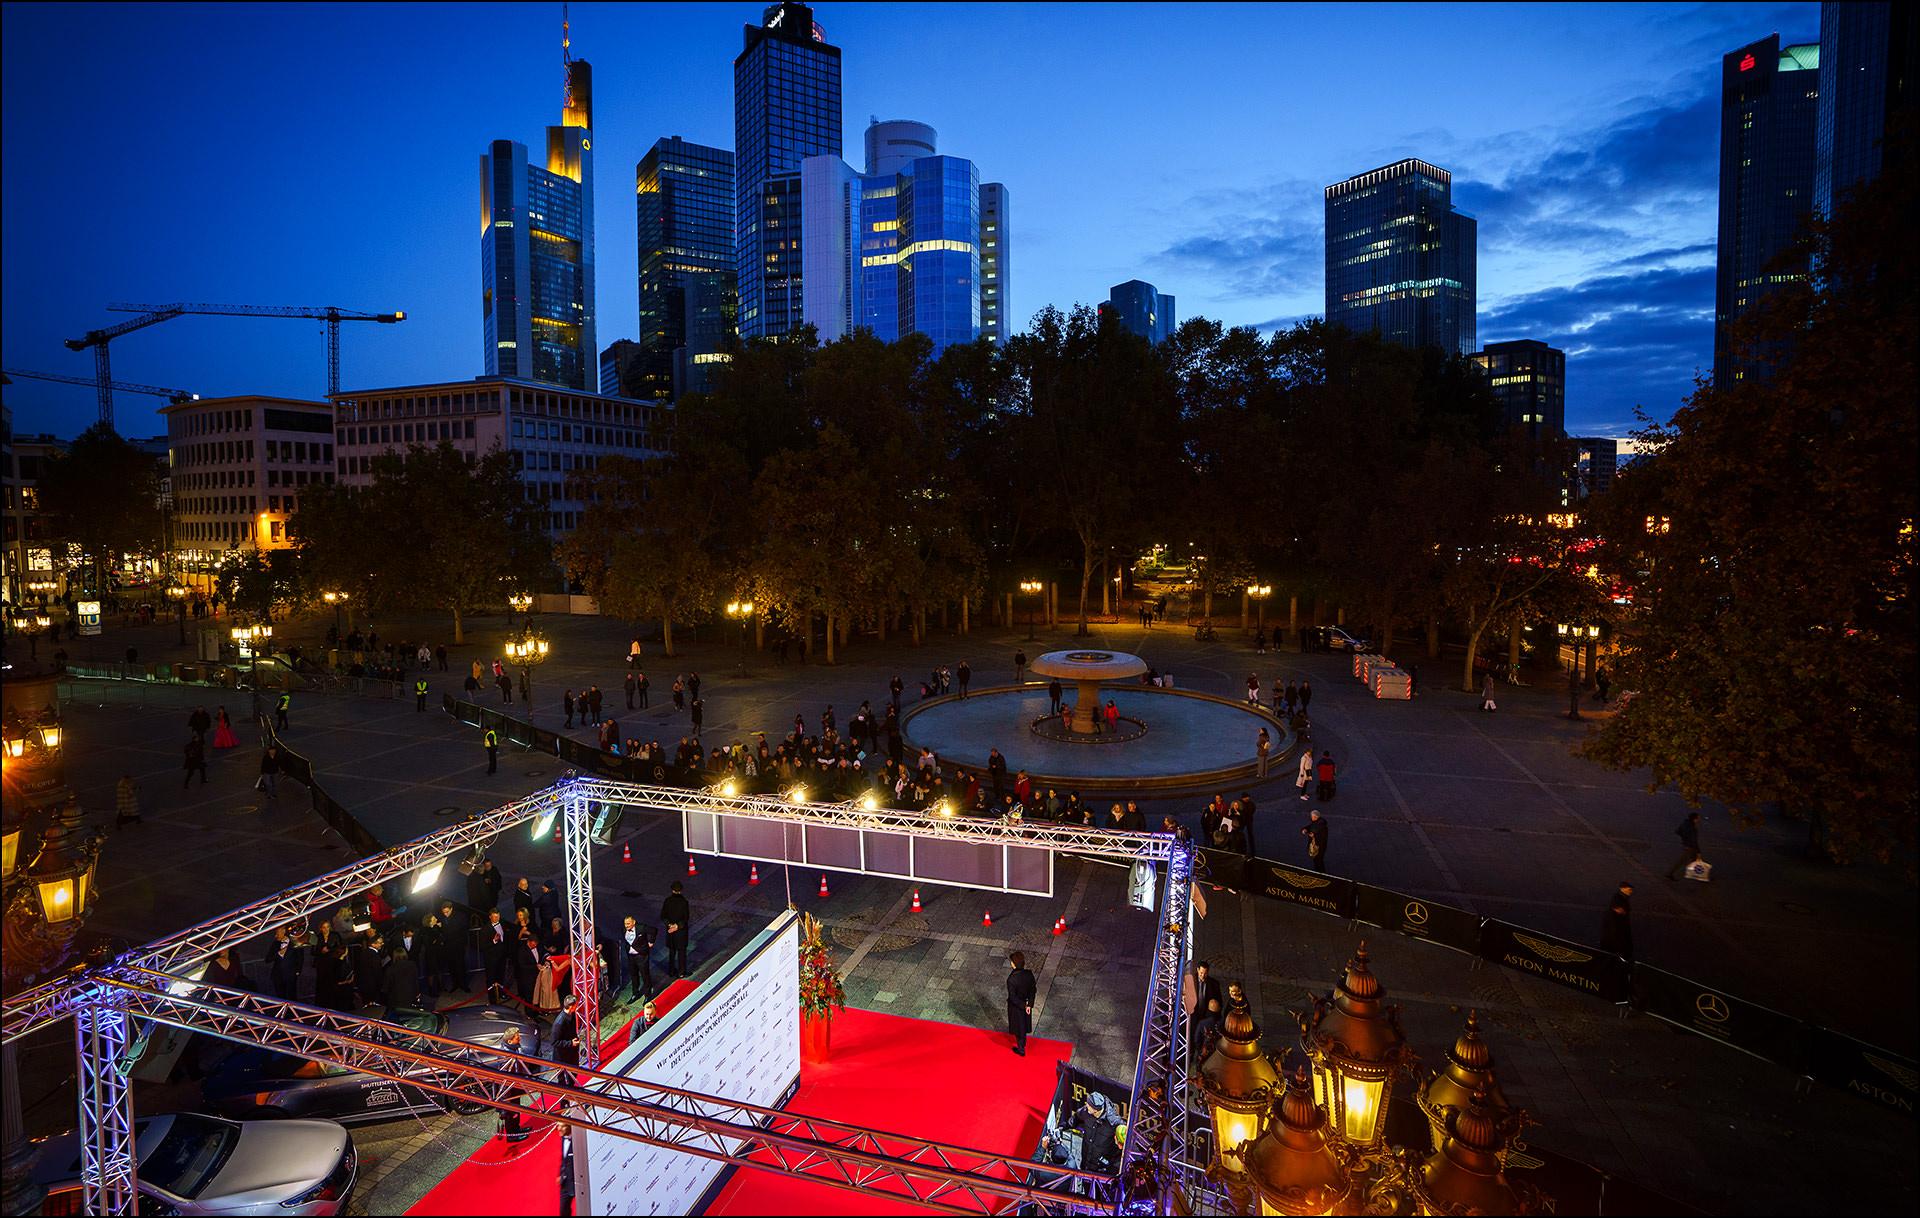 Eventfotografie Frankfurt